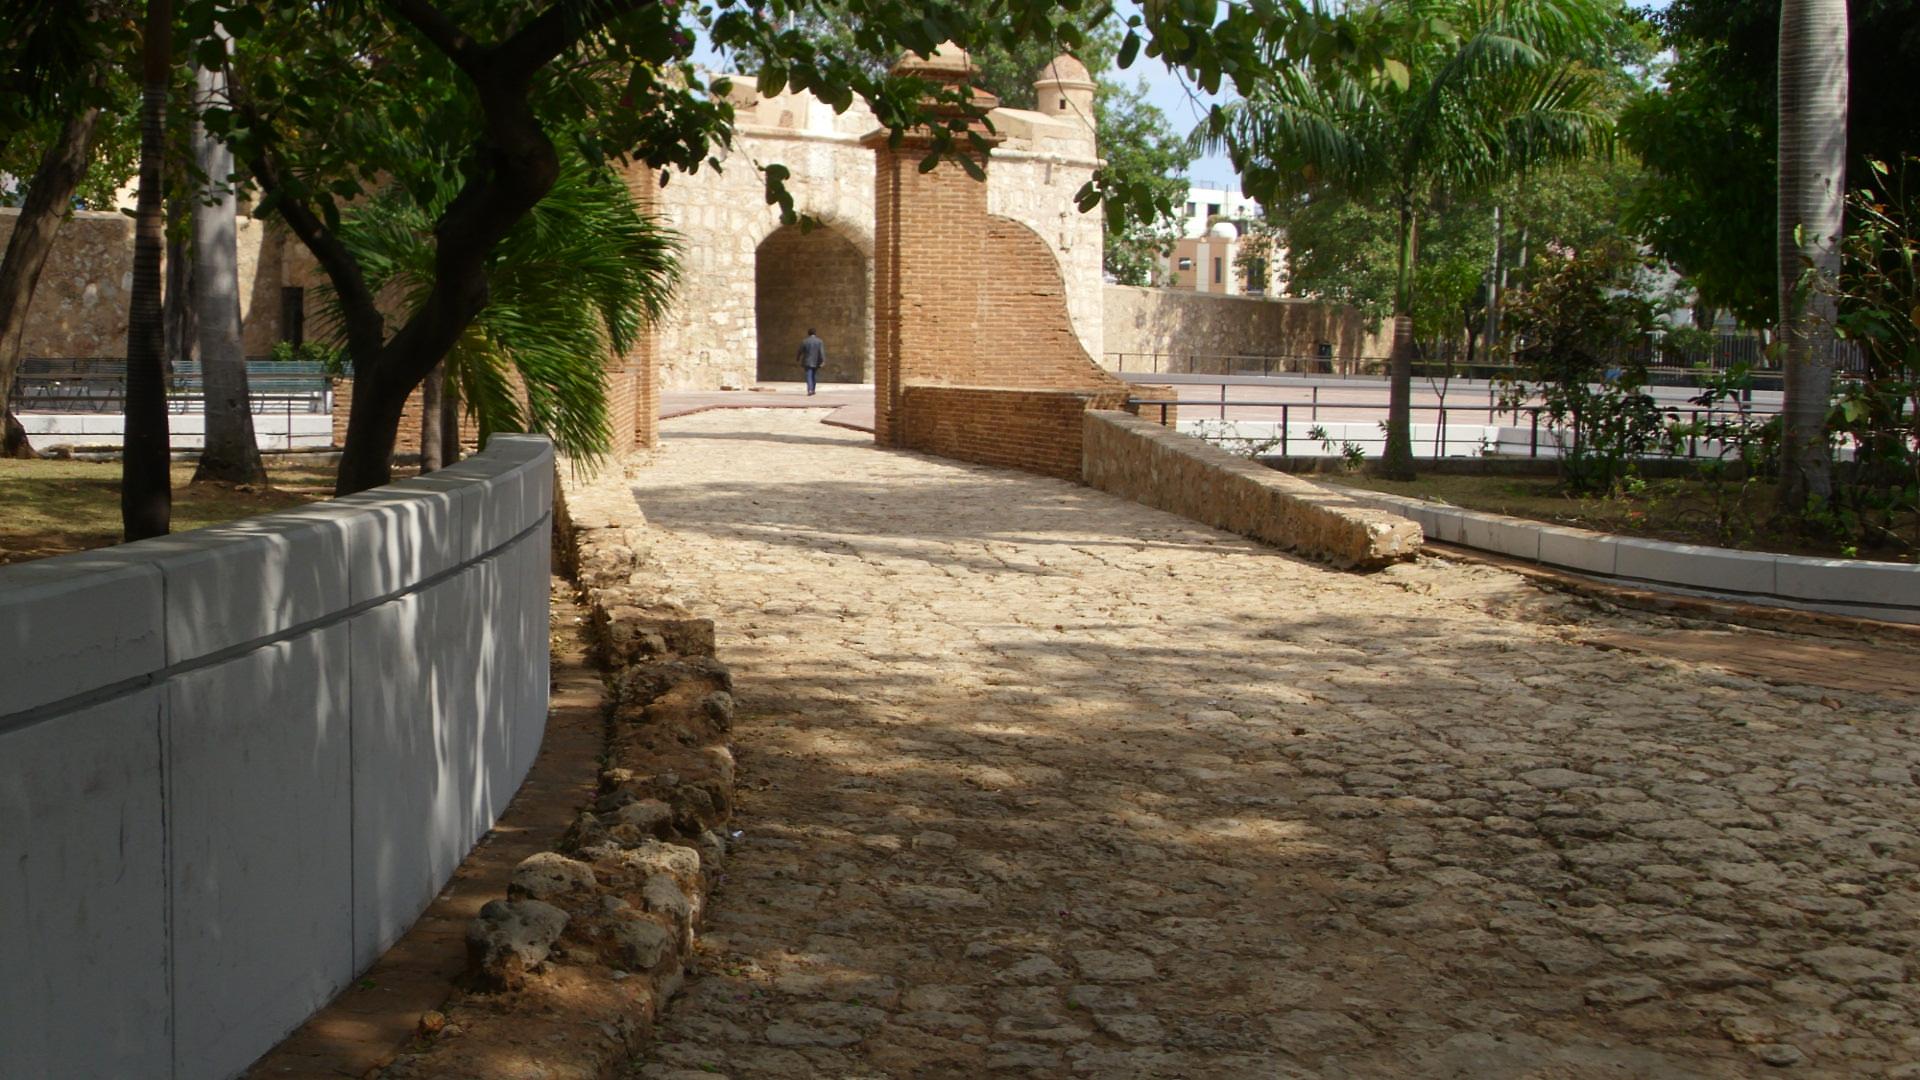 Archivo puerta del conde oude weg 1 jpg wikipedia la for Puerta 4 del jockey